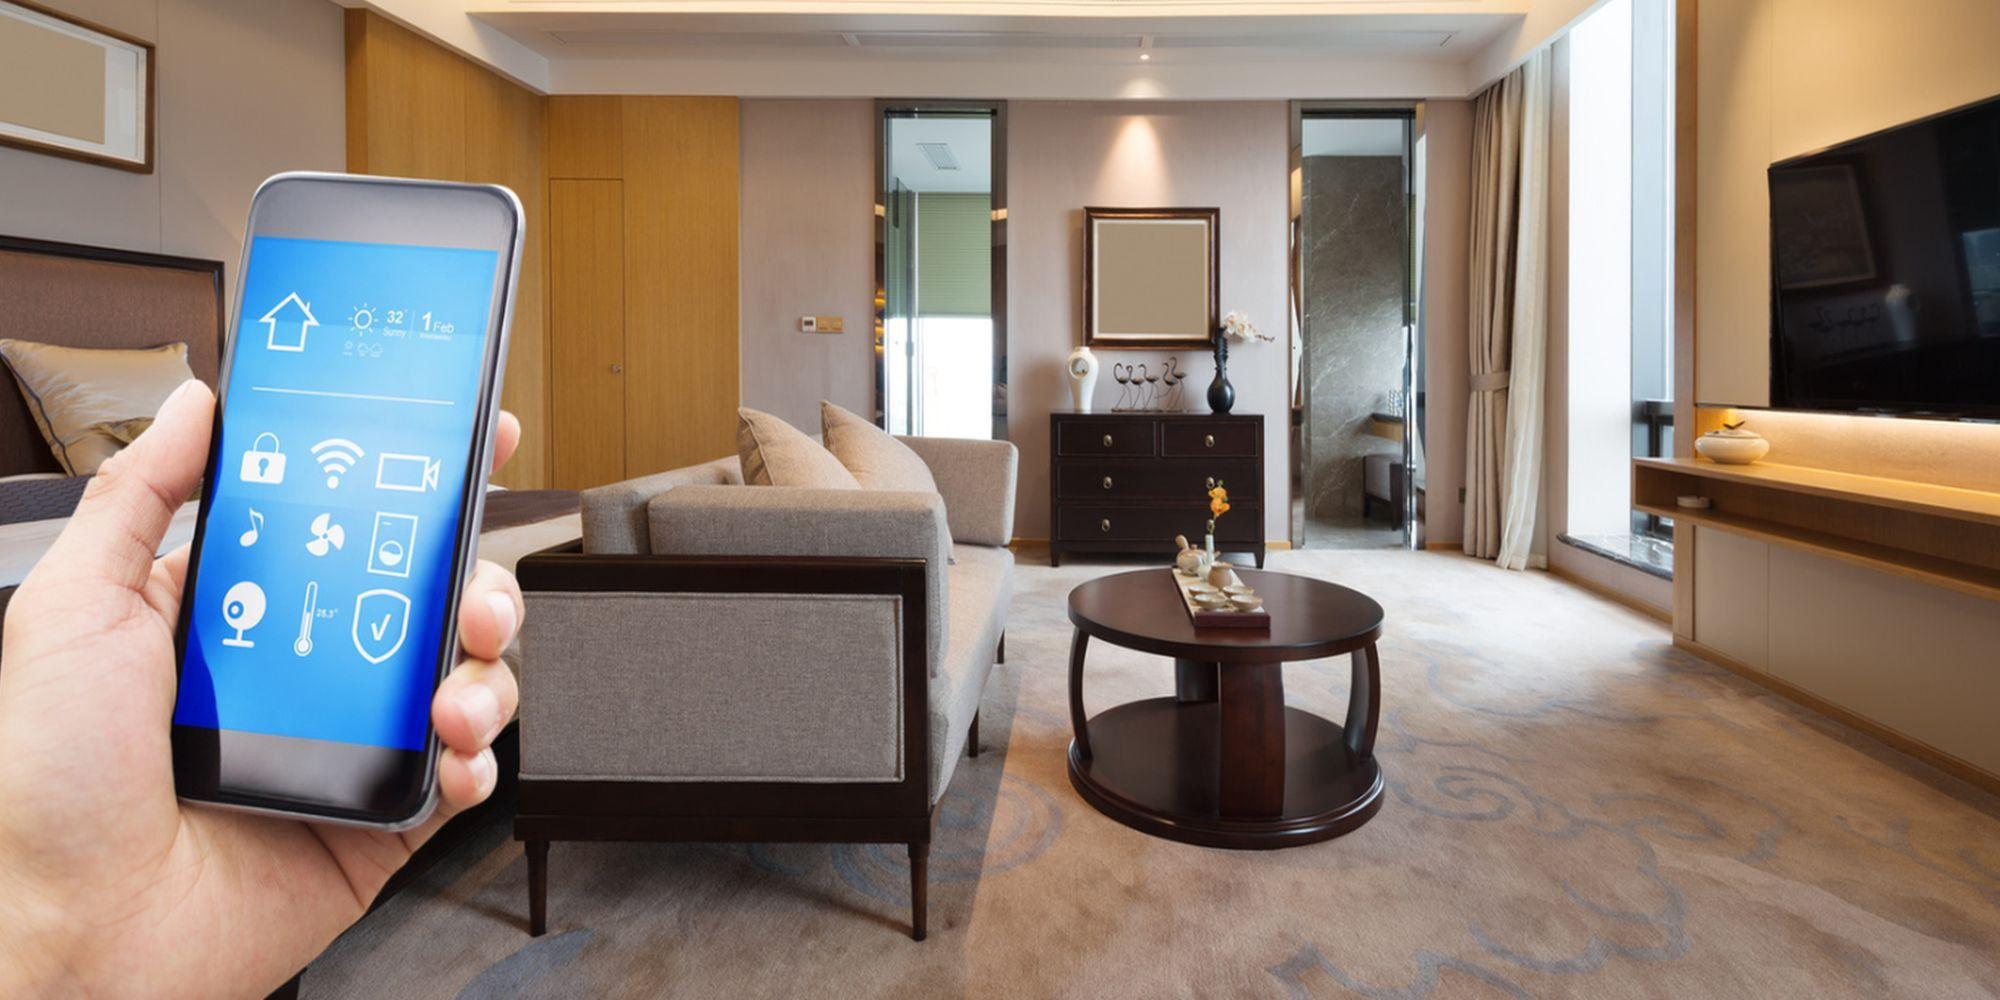 smart home sehr komfortabel aber auch gef hrlich pc welt. Black Bedroom Furniture Sets. Home Design Ideas